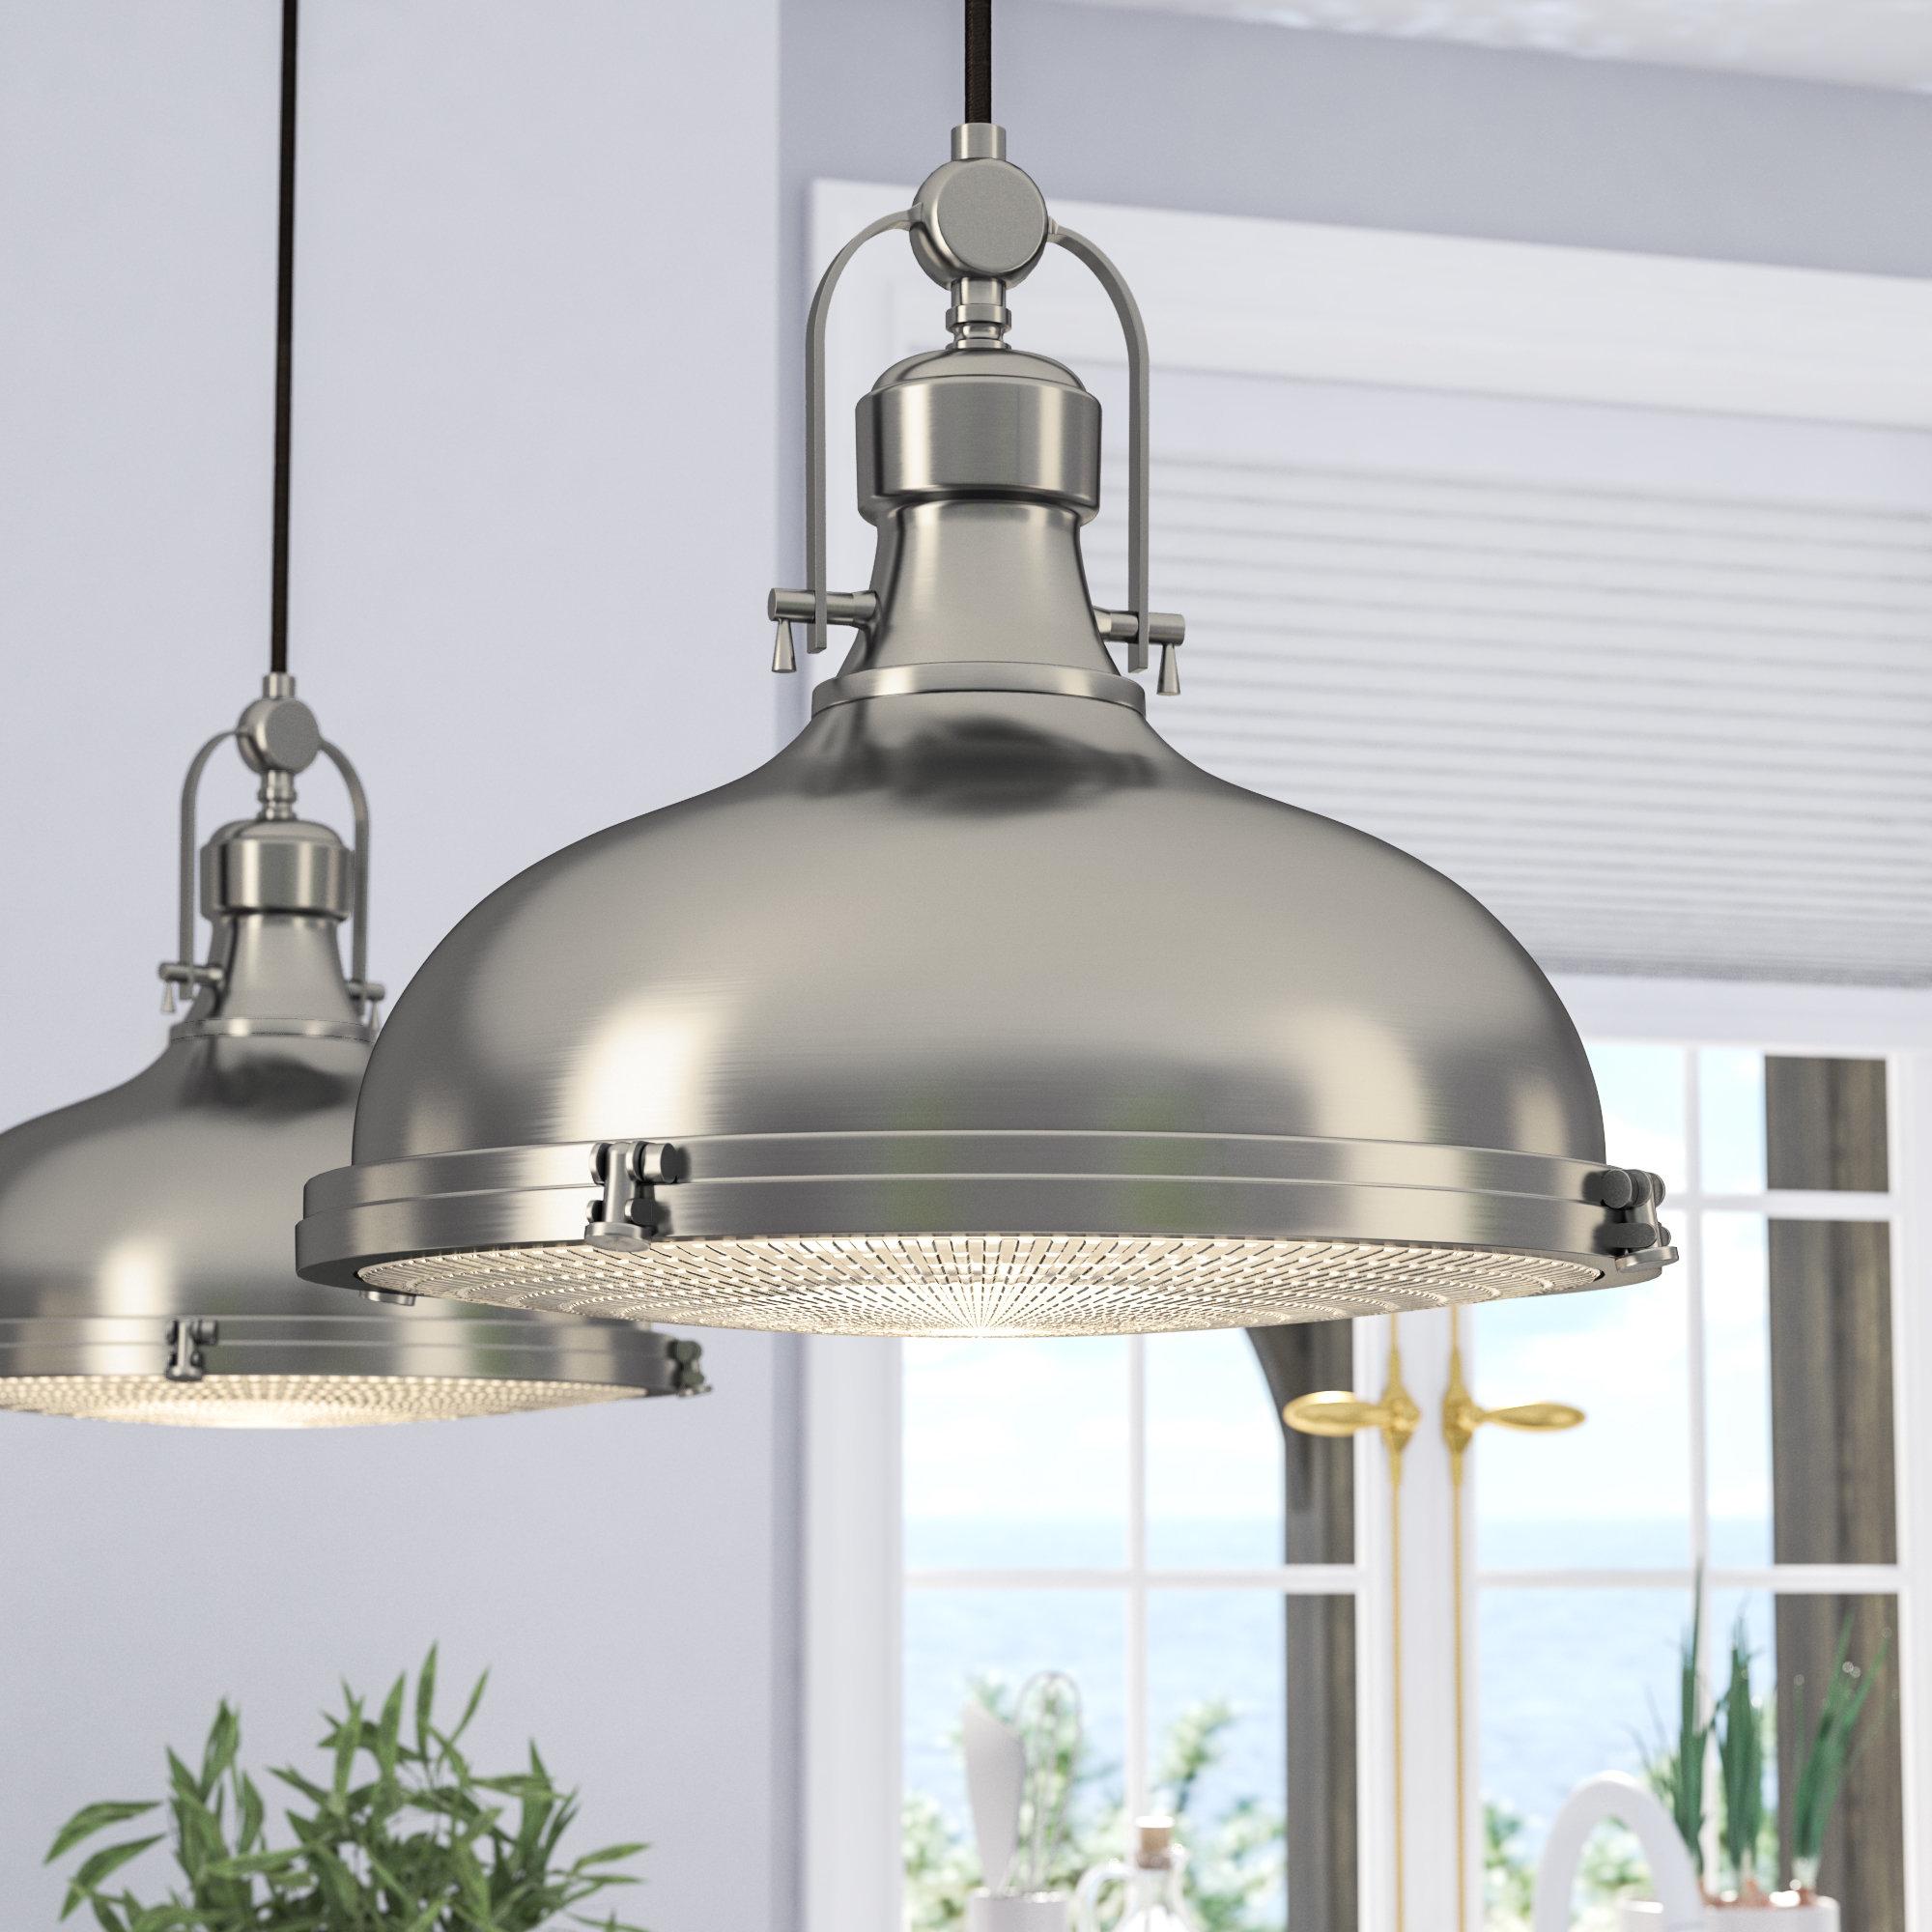 Freeda 1 Light Single Dome Pendant Pertaining To Widely Used Priston 1 Light Single Dome Pendants (Gallery 17 of 20)